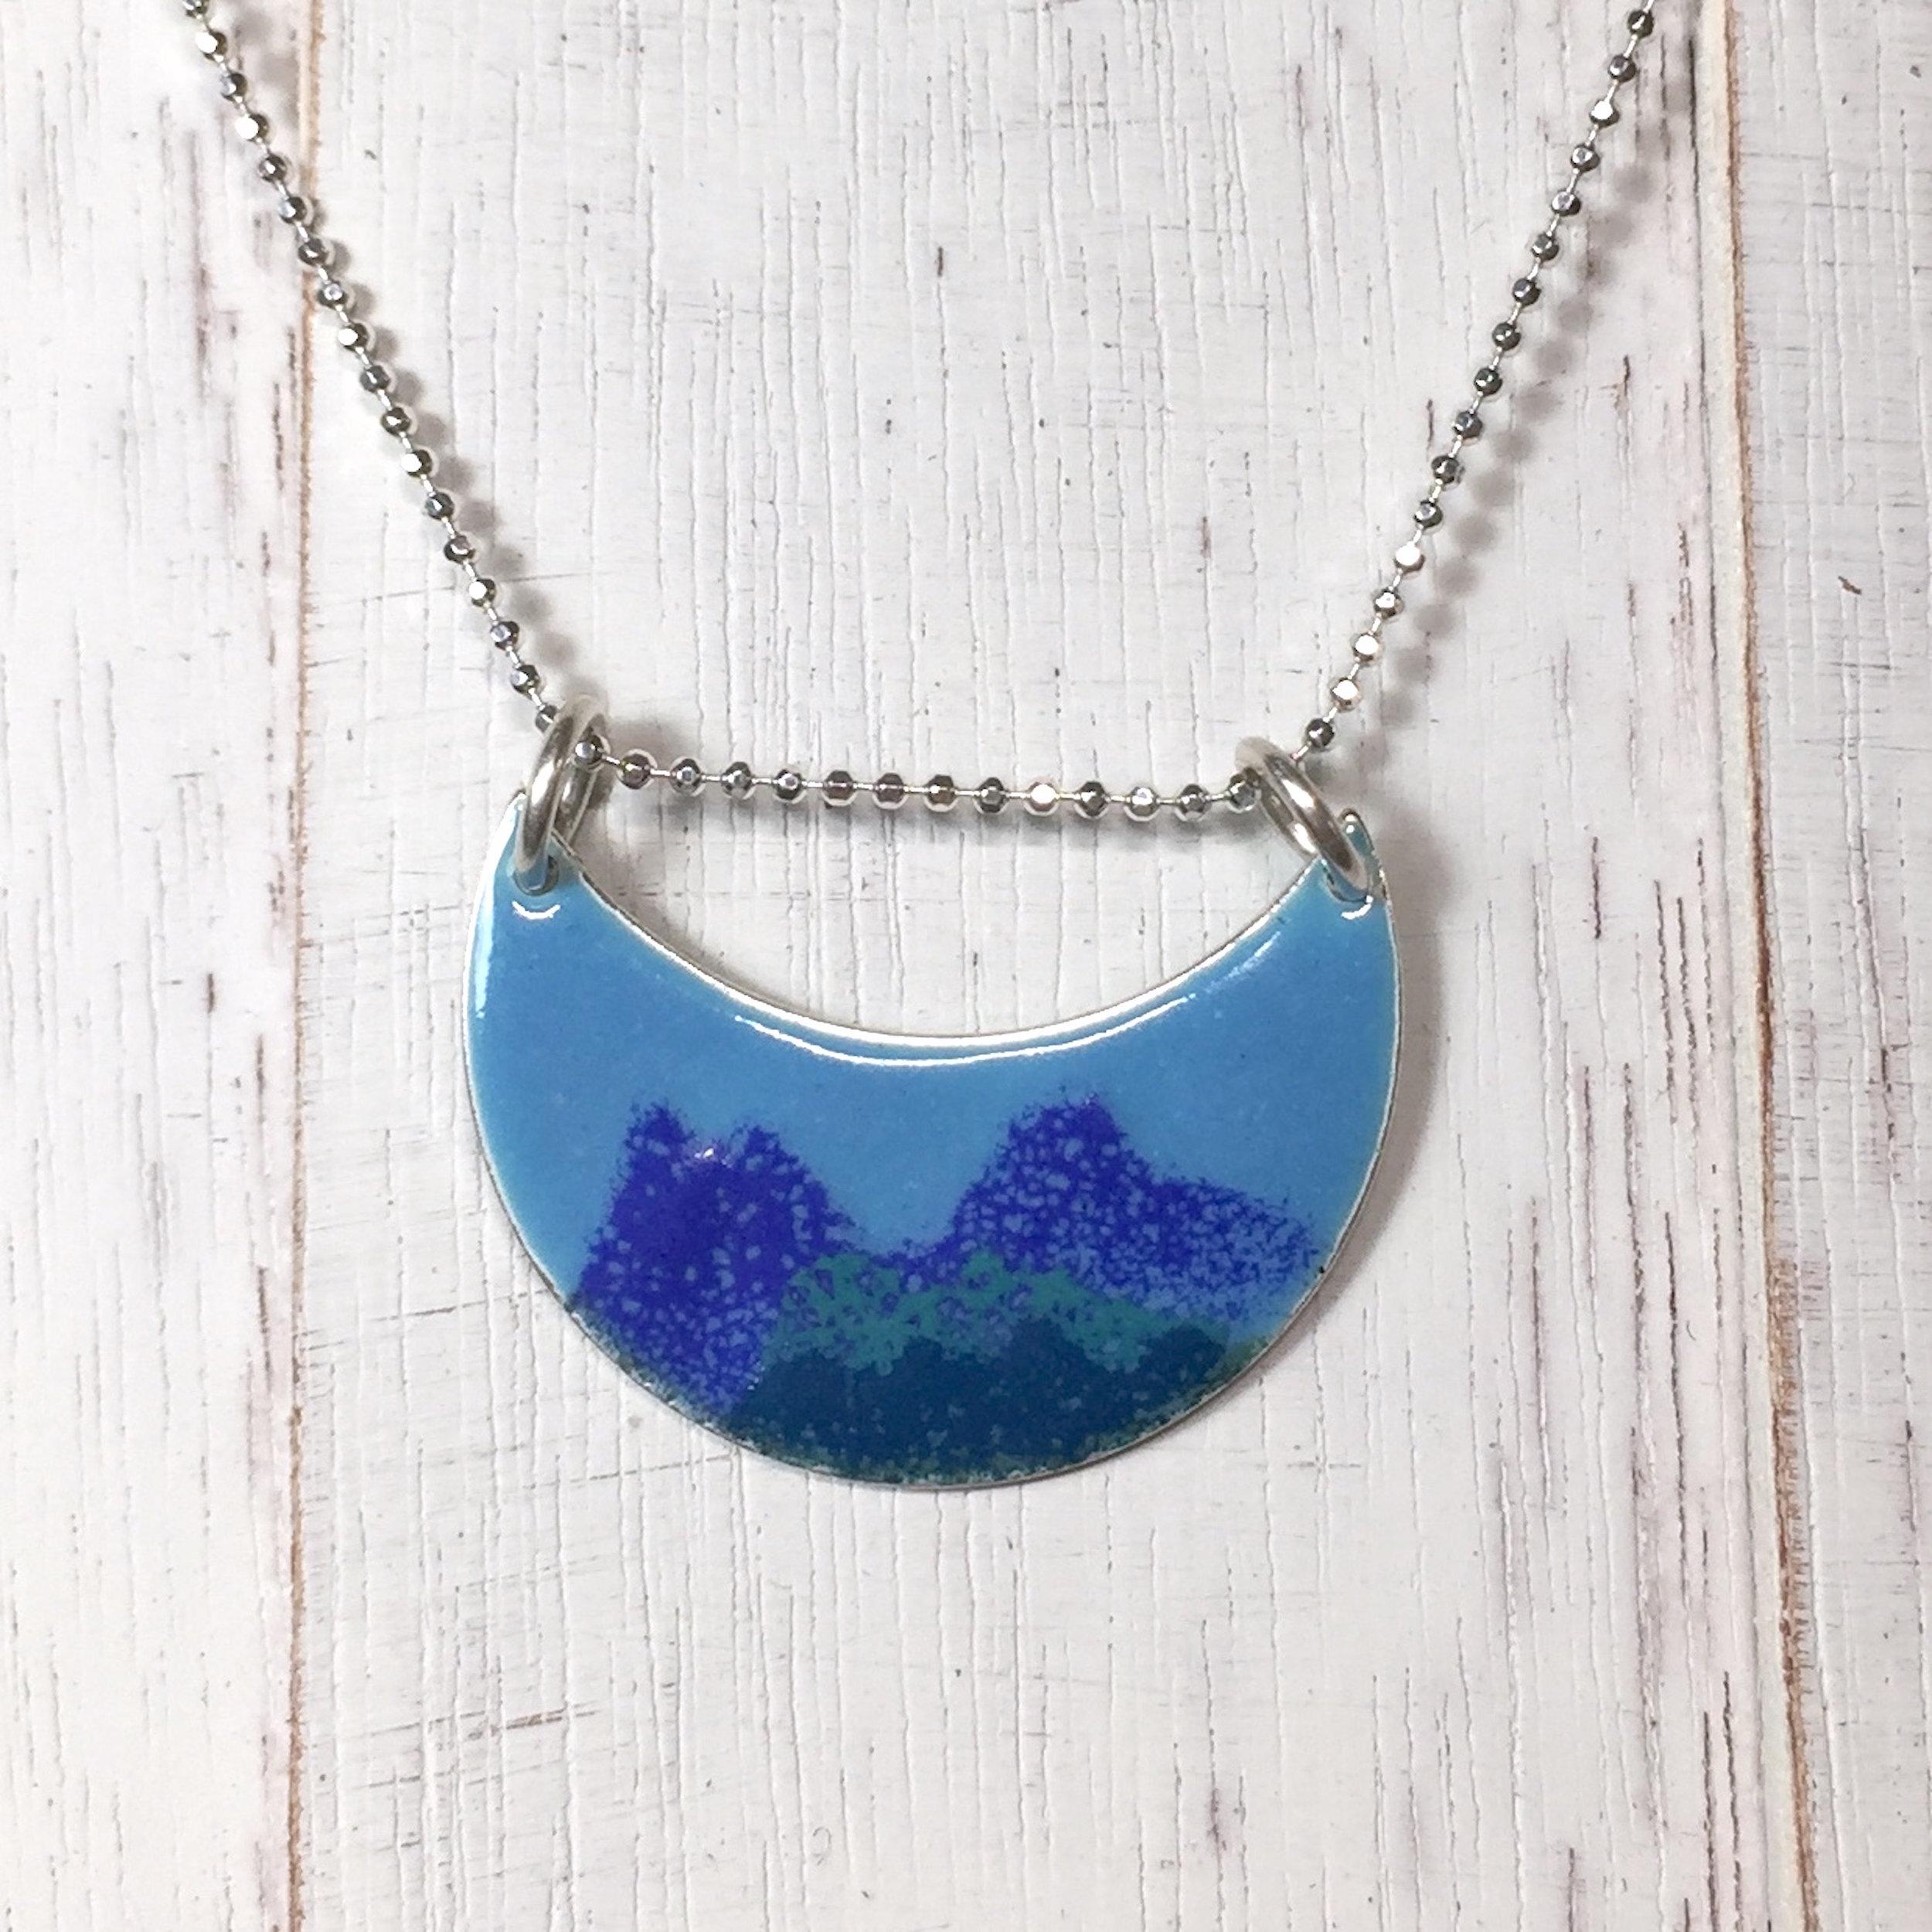 ignite-jewelry-studios-blue-ridge-pendant-asheville.jpg